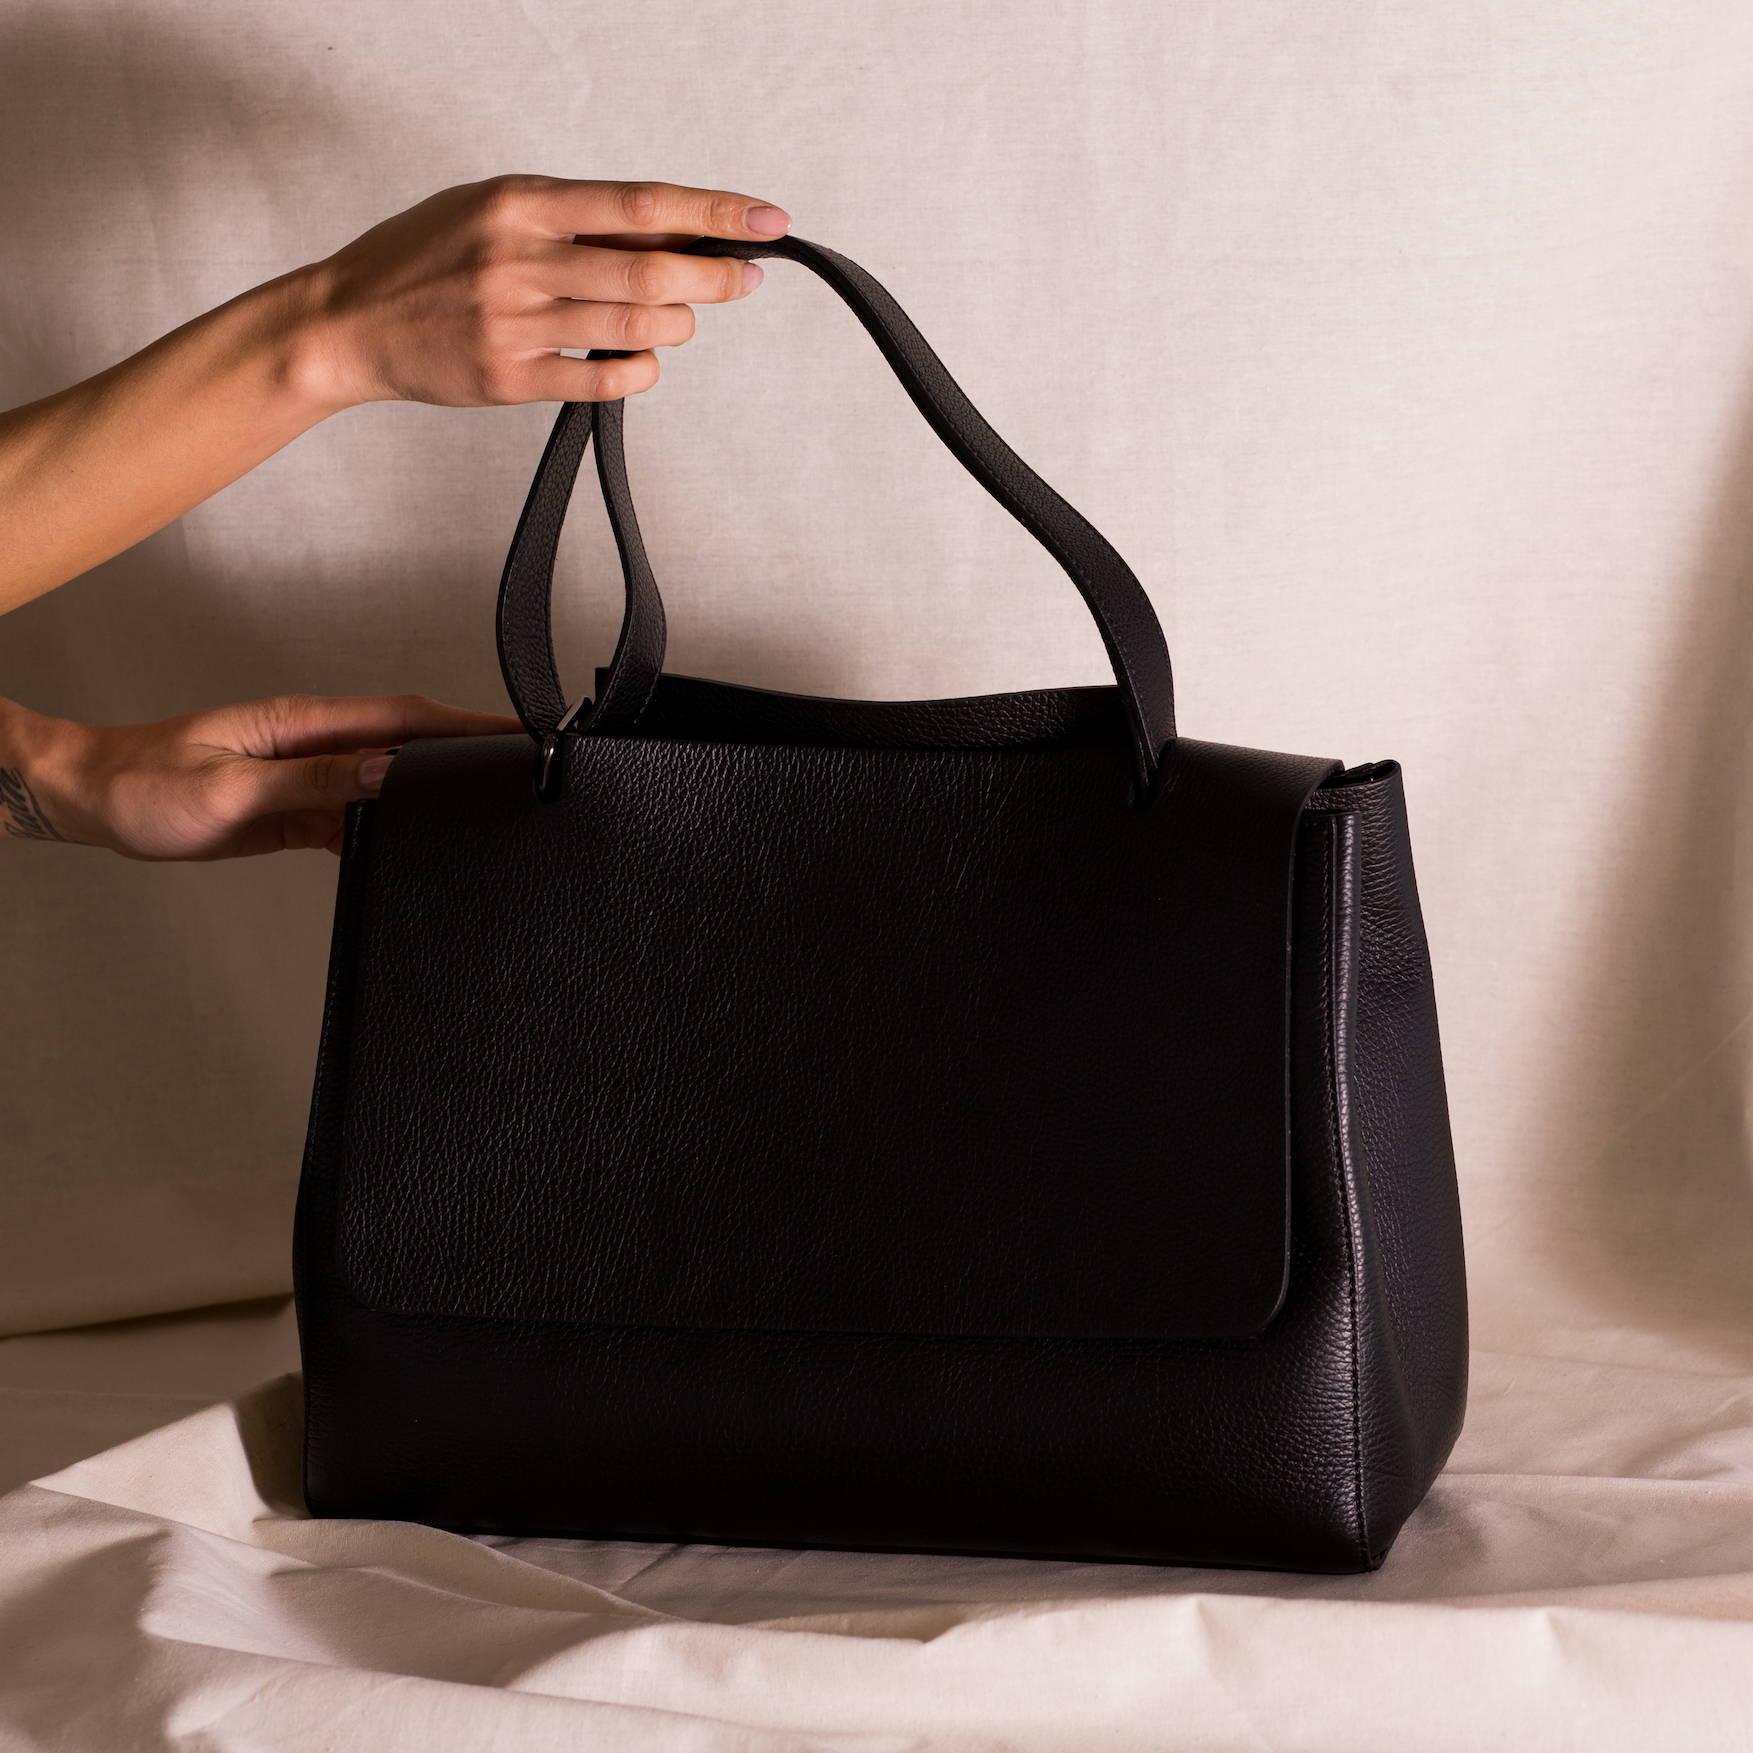 Vestirsi KATIE Leather Handbag handmade in Italy with black quality pebbled Italian leather